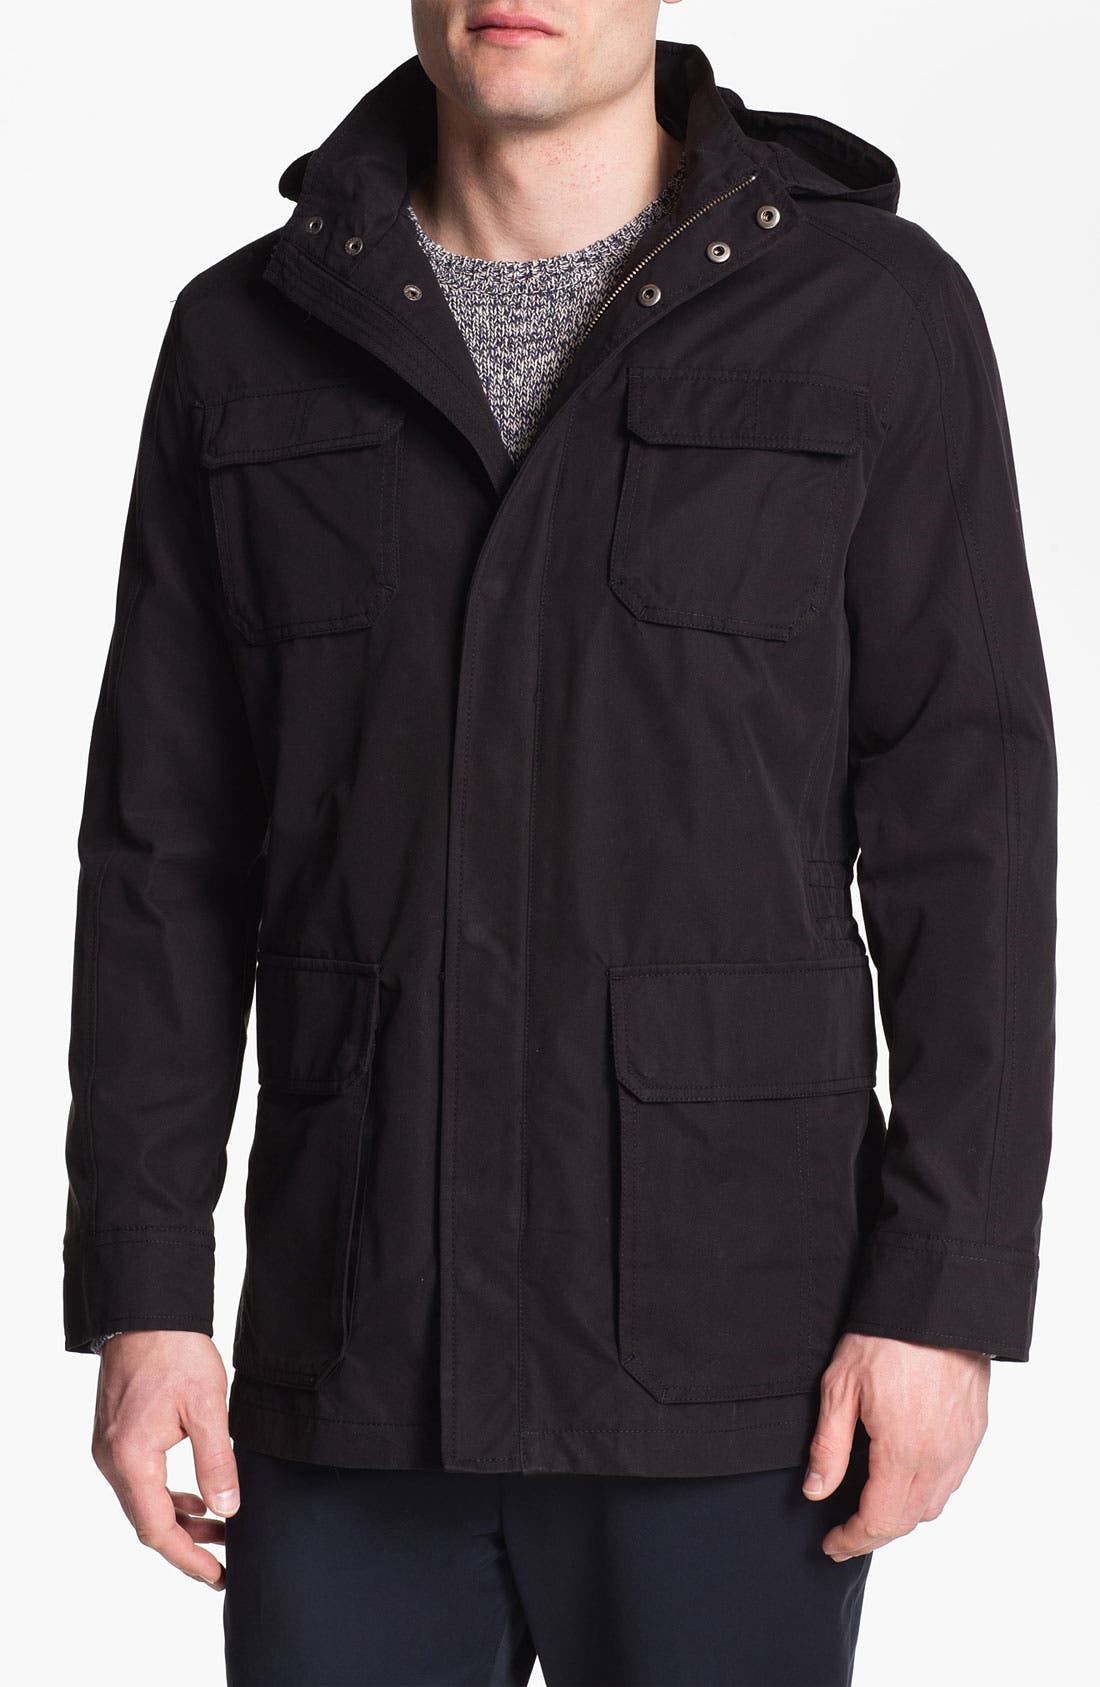 Alternate Image 1 Selected - Cole Haan Duffle Jacket